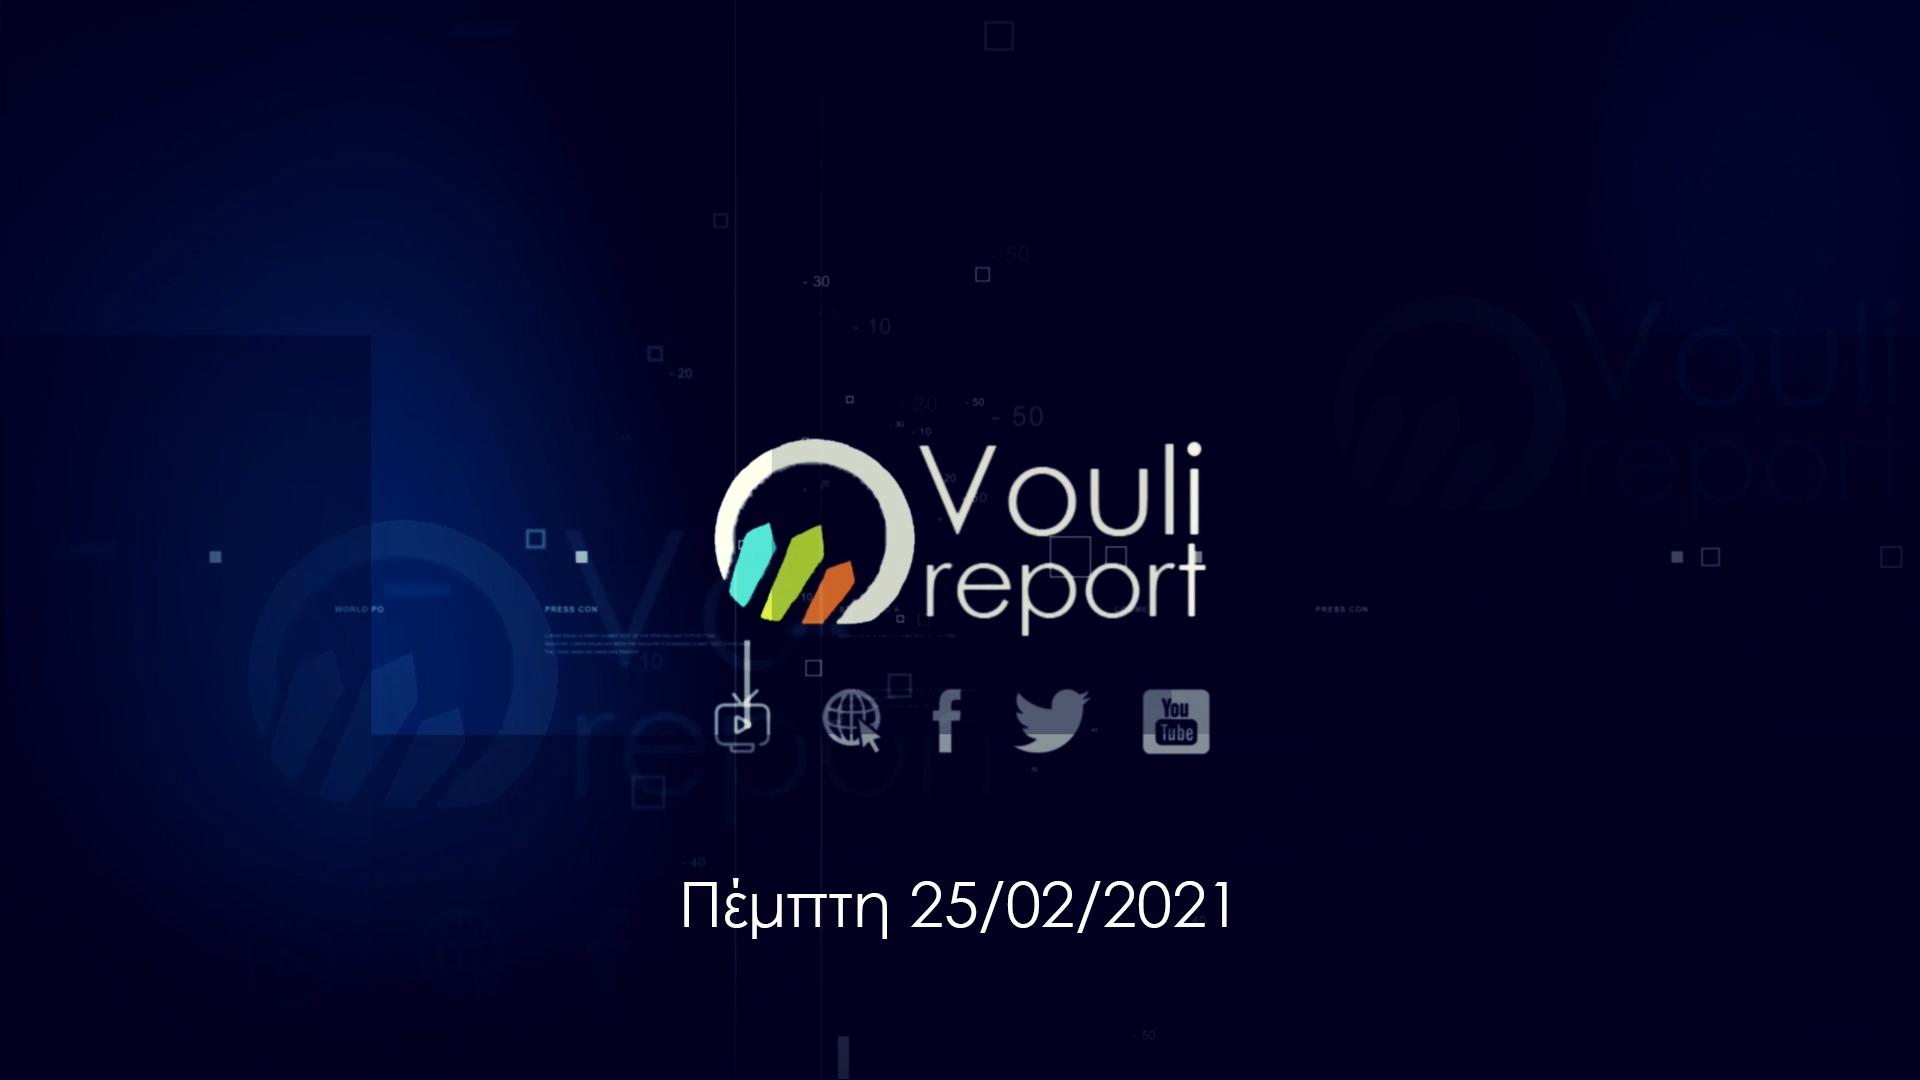 Vouli report | 25/02/2021